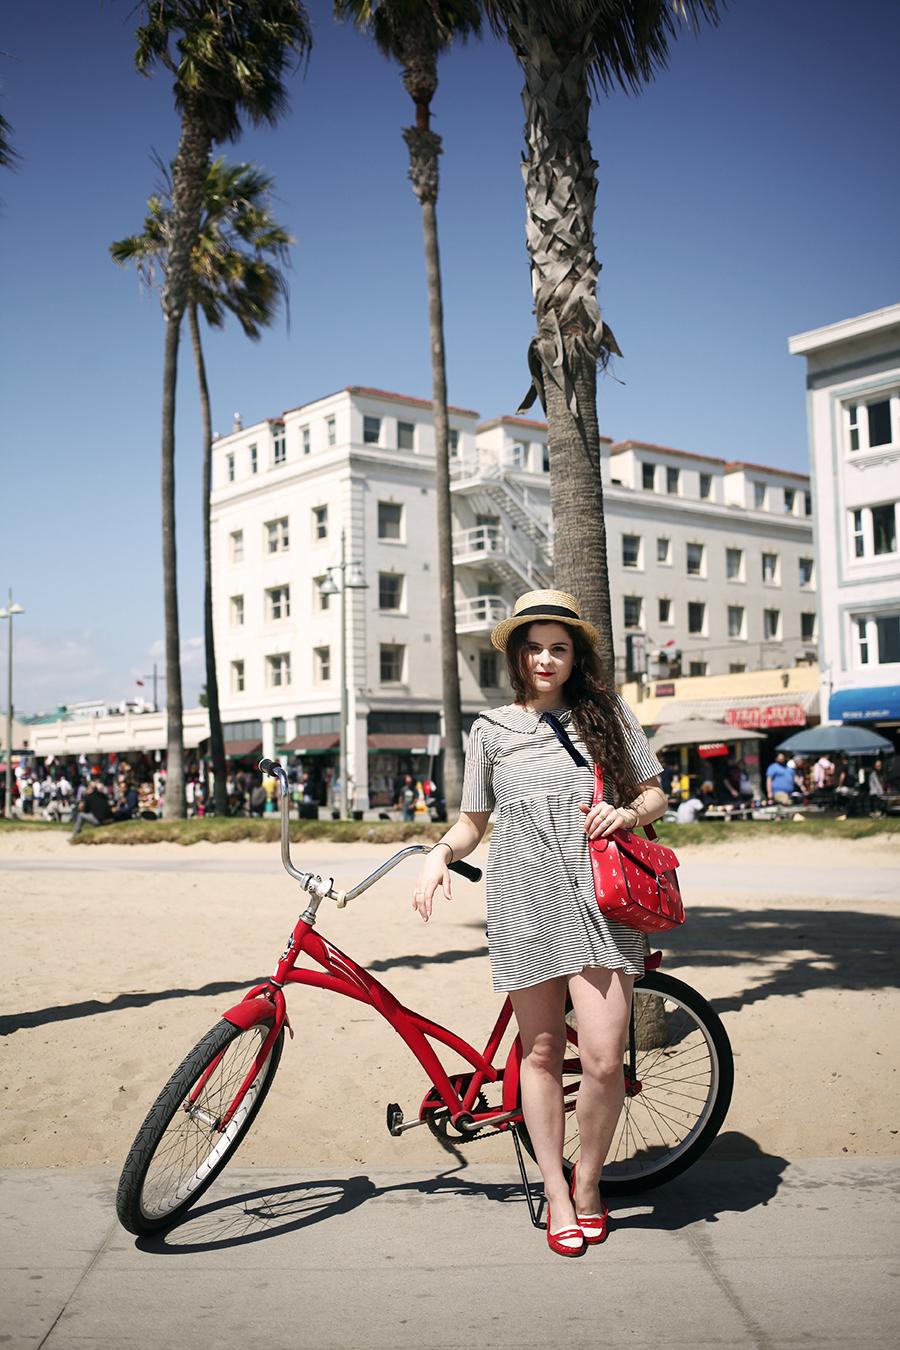 Venice beach bike rides